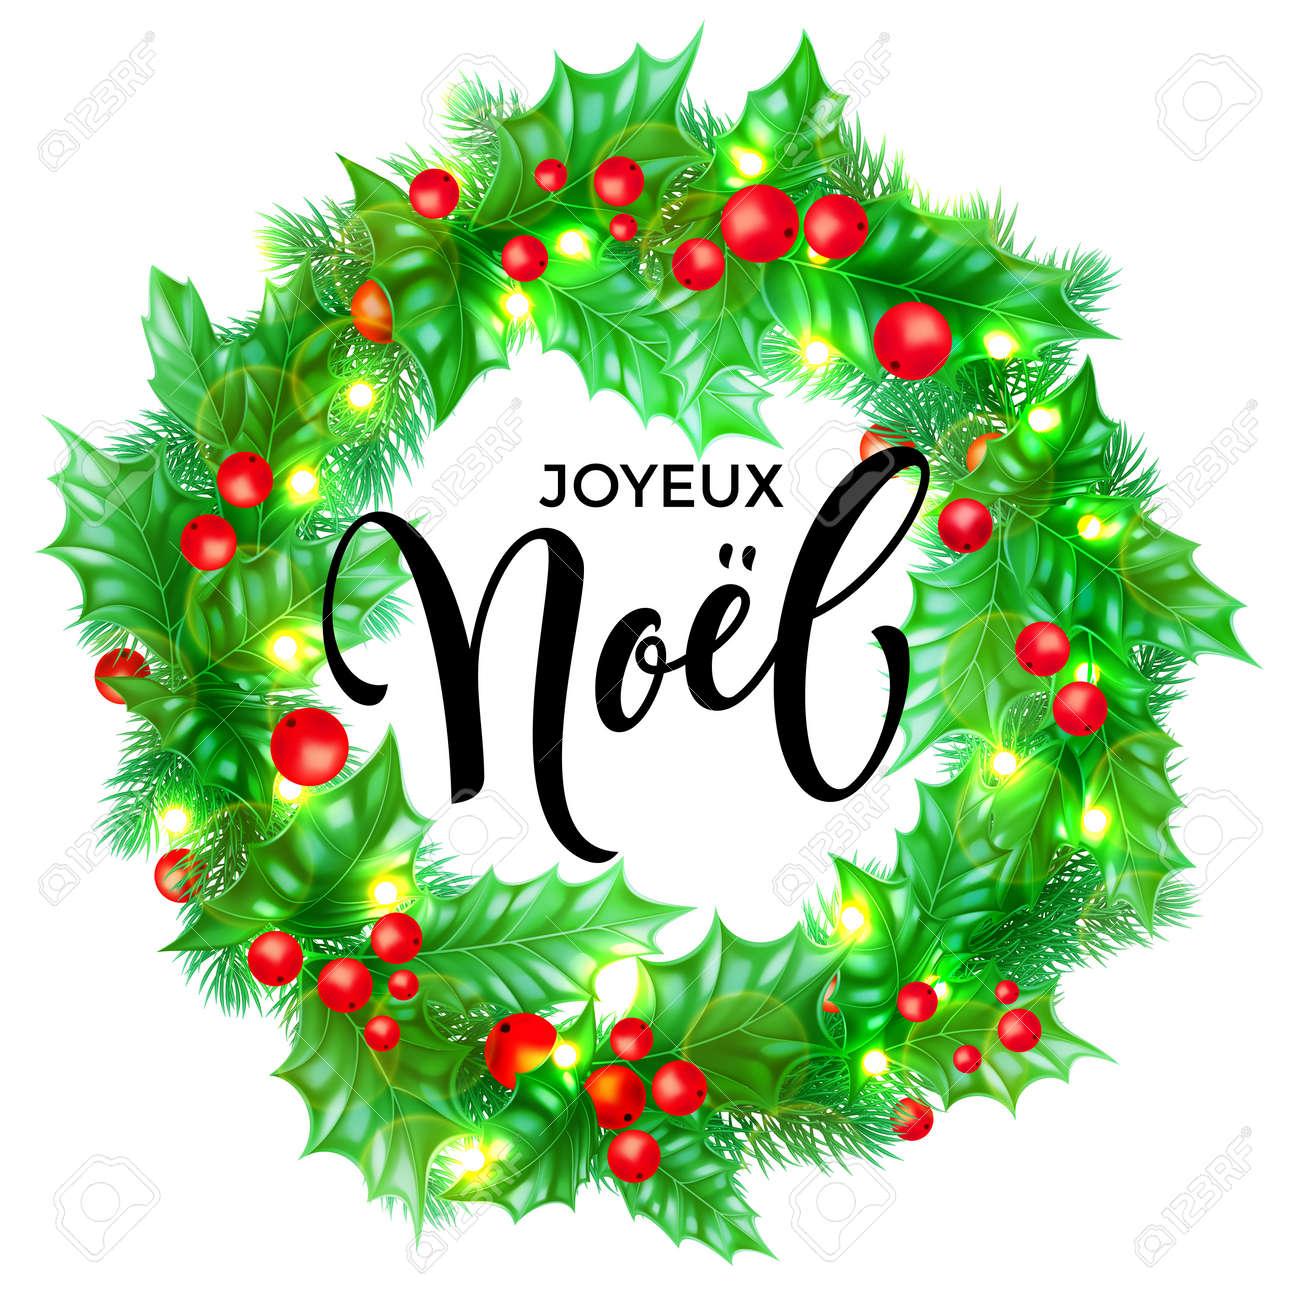 Joyeux Noel Audio.Joyeux Noel French Merry Christmas Hand Drawn Quote Calligraphy